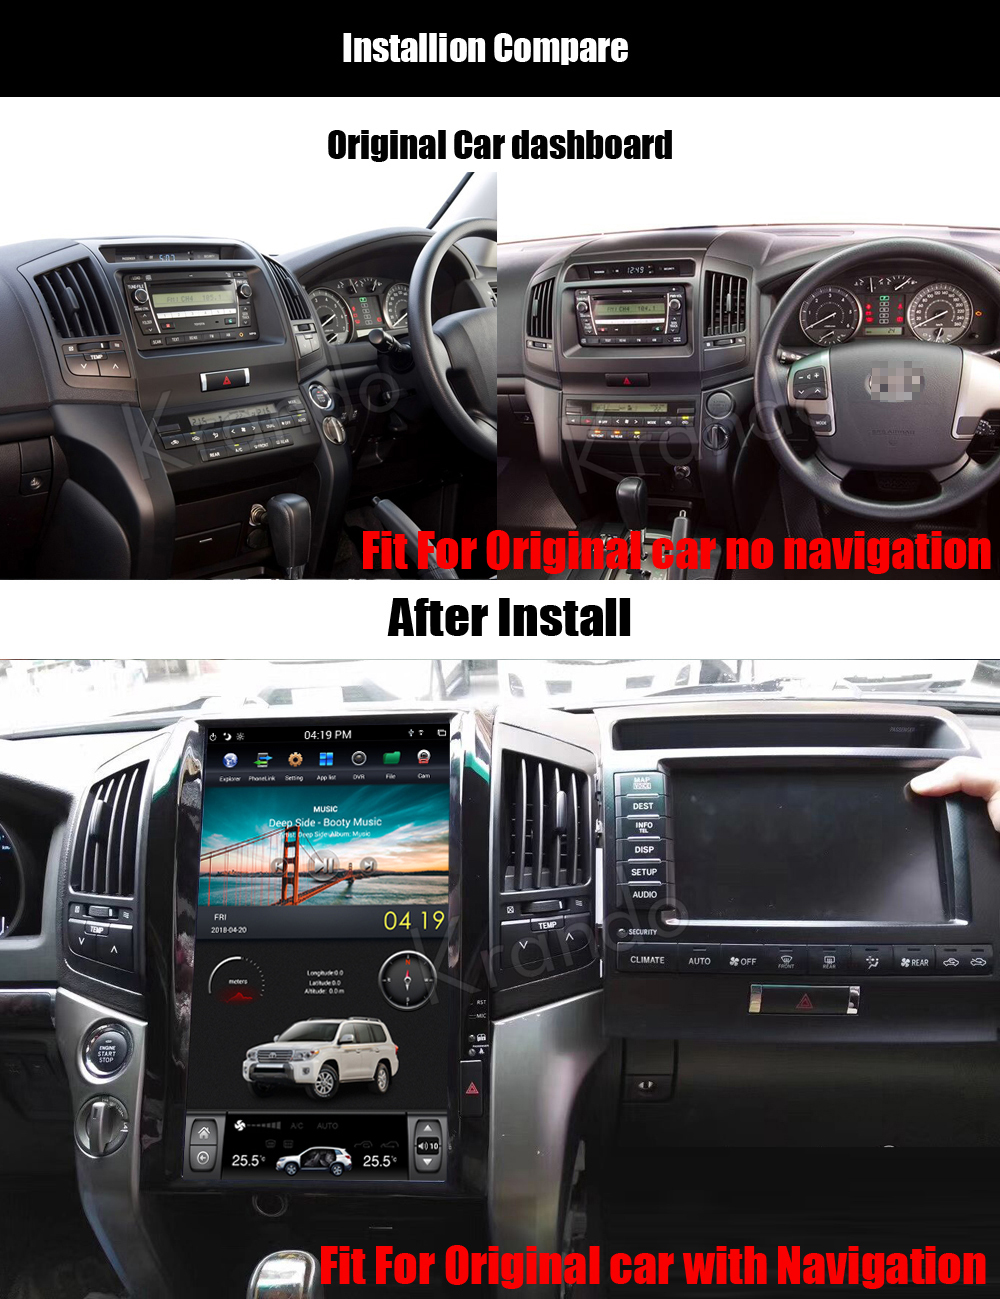 Krando android car radio stereo navigation gps for toyota land cruiser 200 2008-2015 car dvd player multimedia system